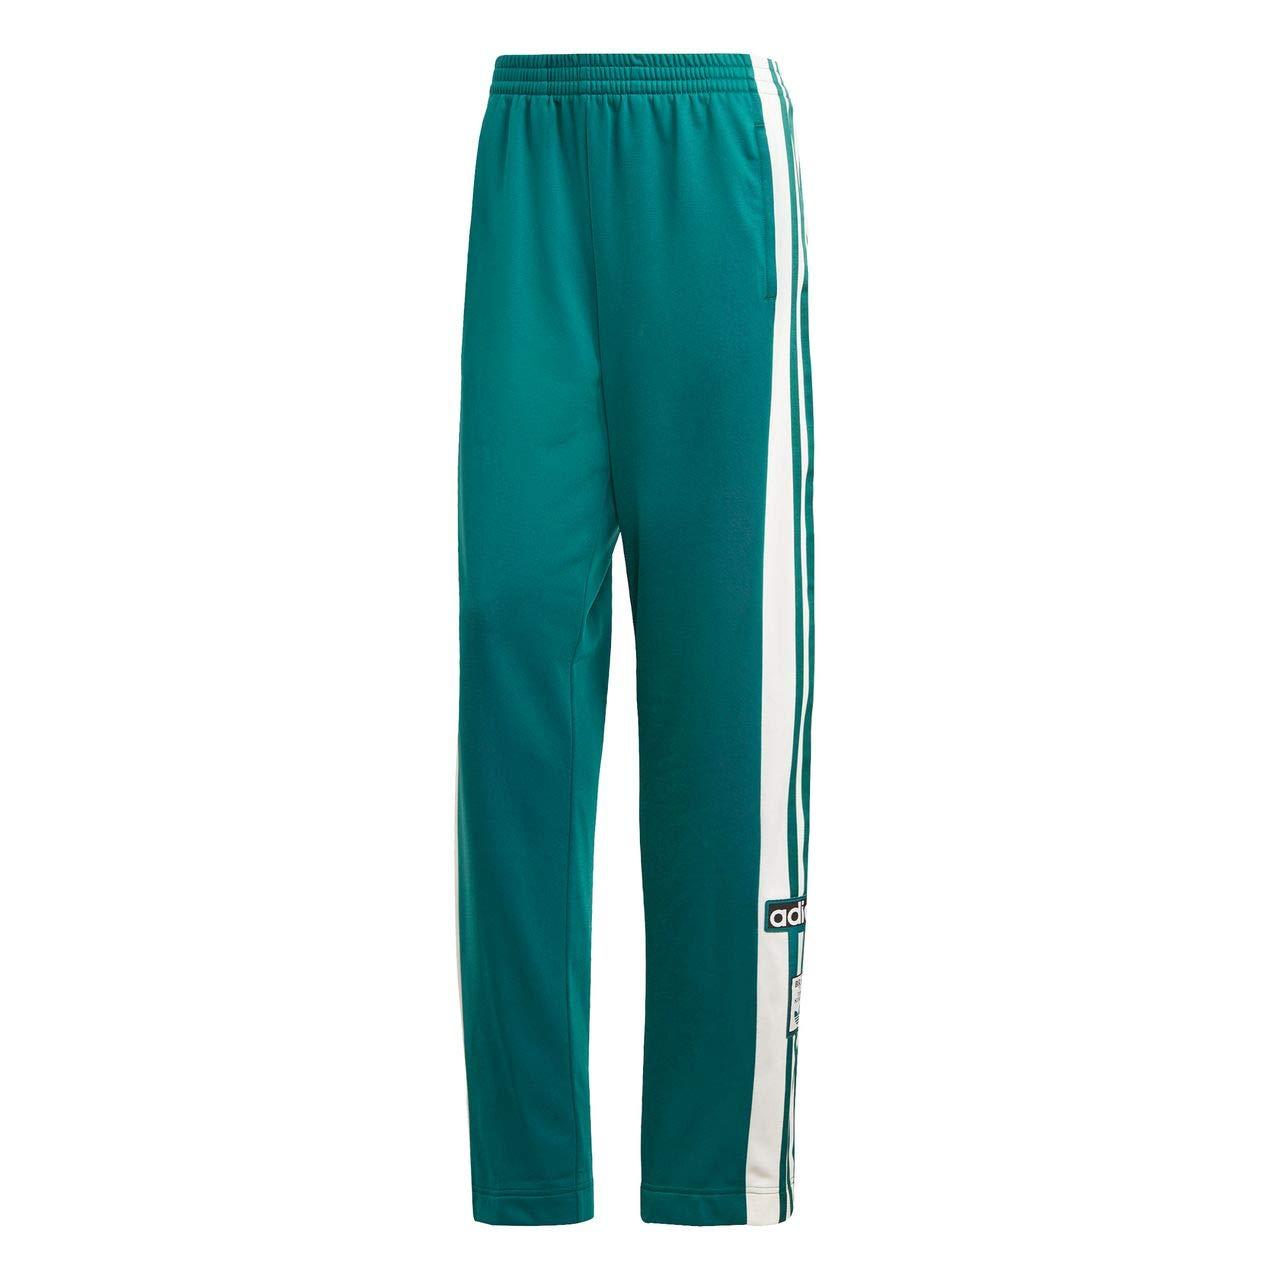 adidas Track Pants Hose, Damen: : Bekleidung